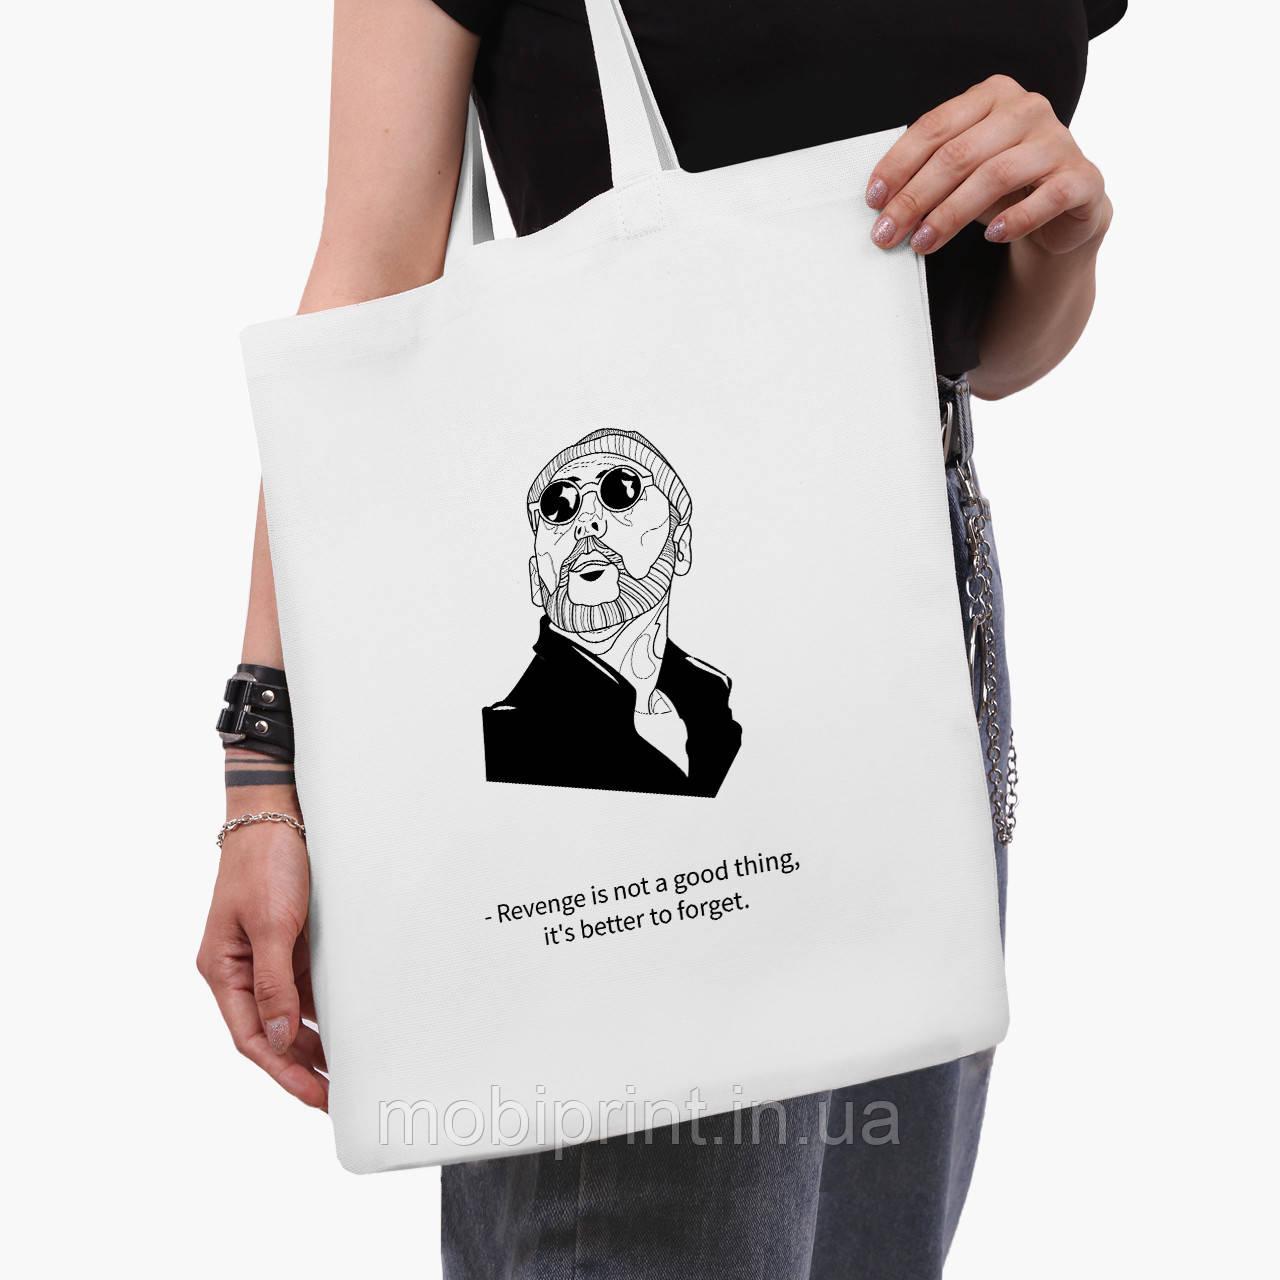 Эко сумка шоппер белая Леон киллер (Leon) (9227-1451-3)  41*35 см